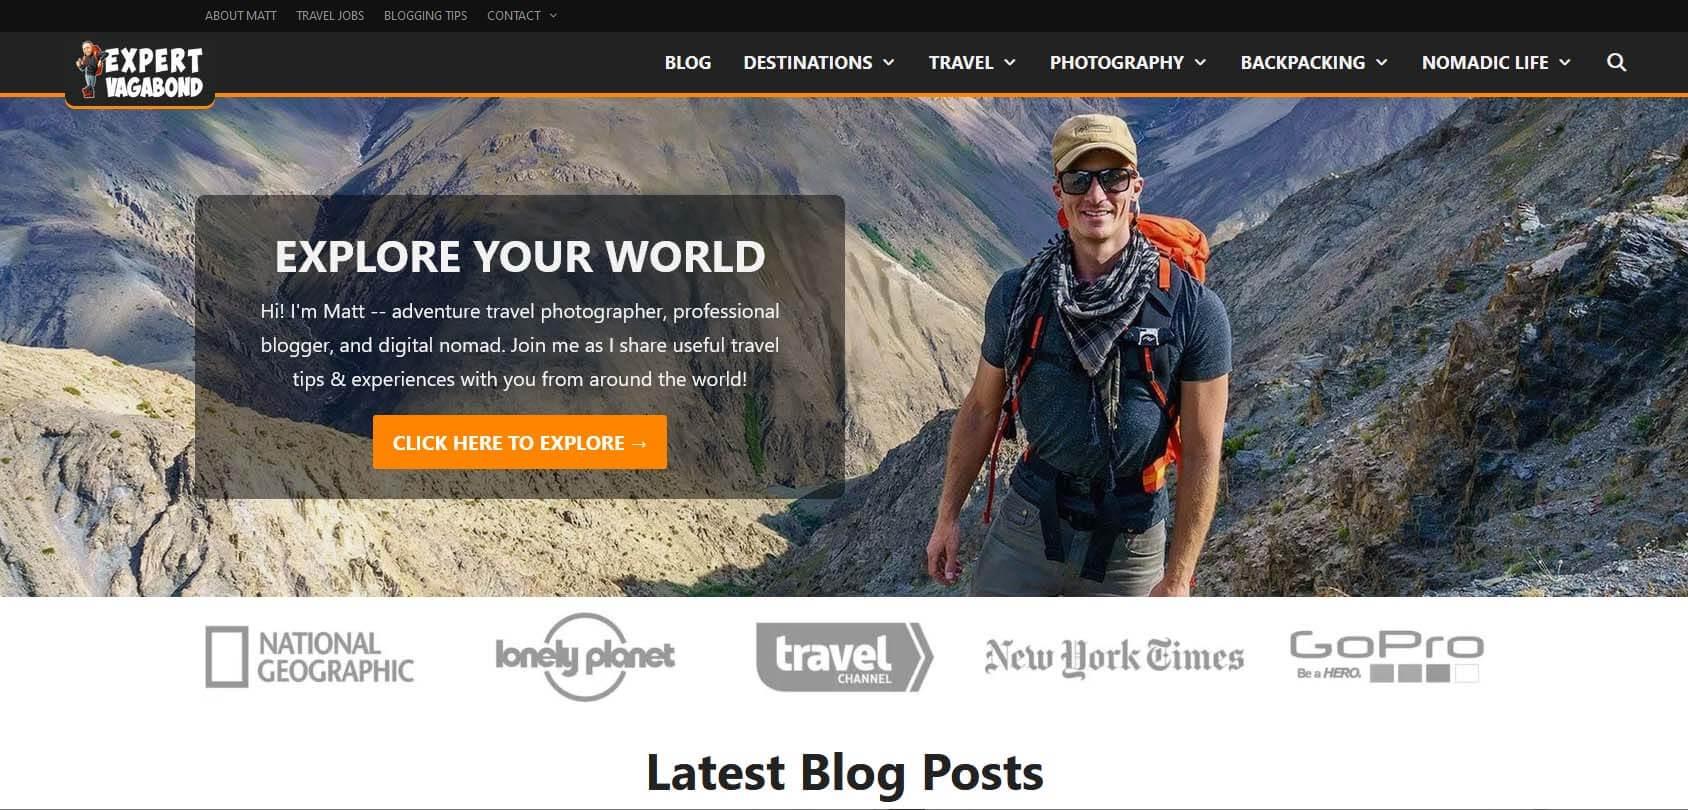 Expert Vagabond Homepage